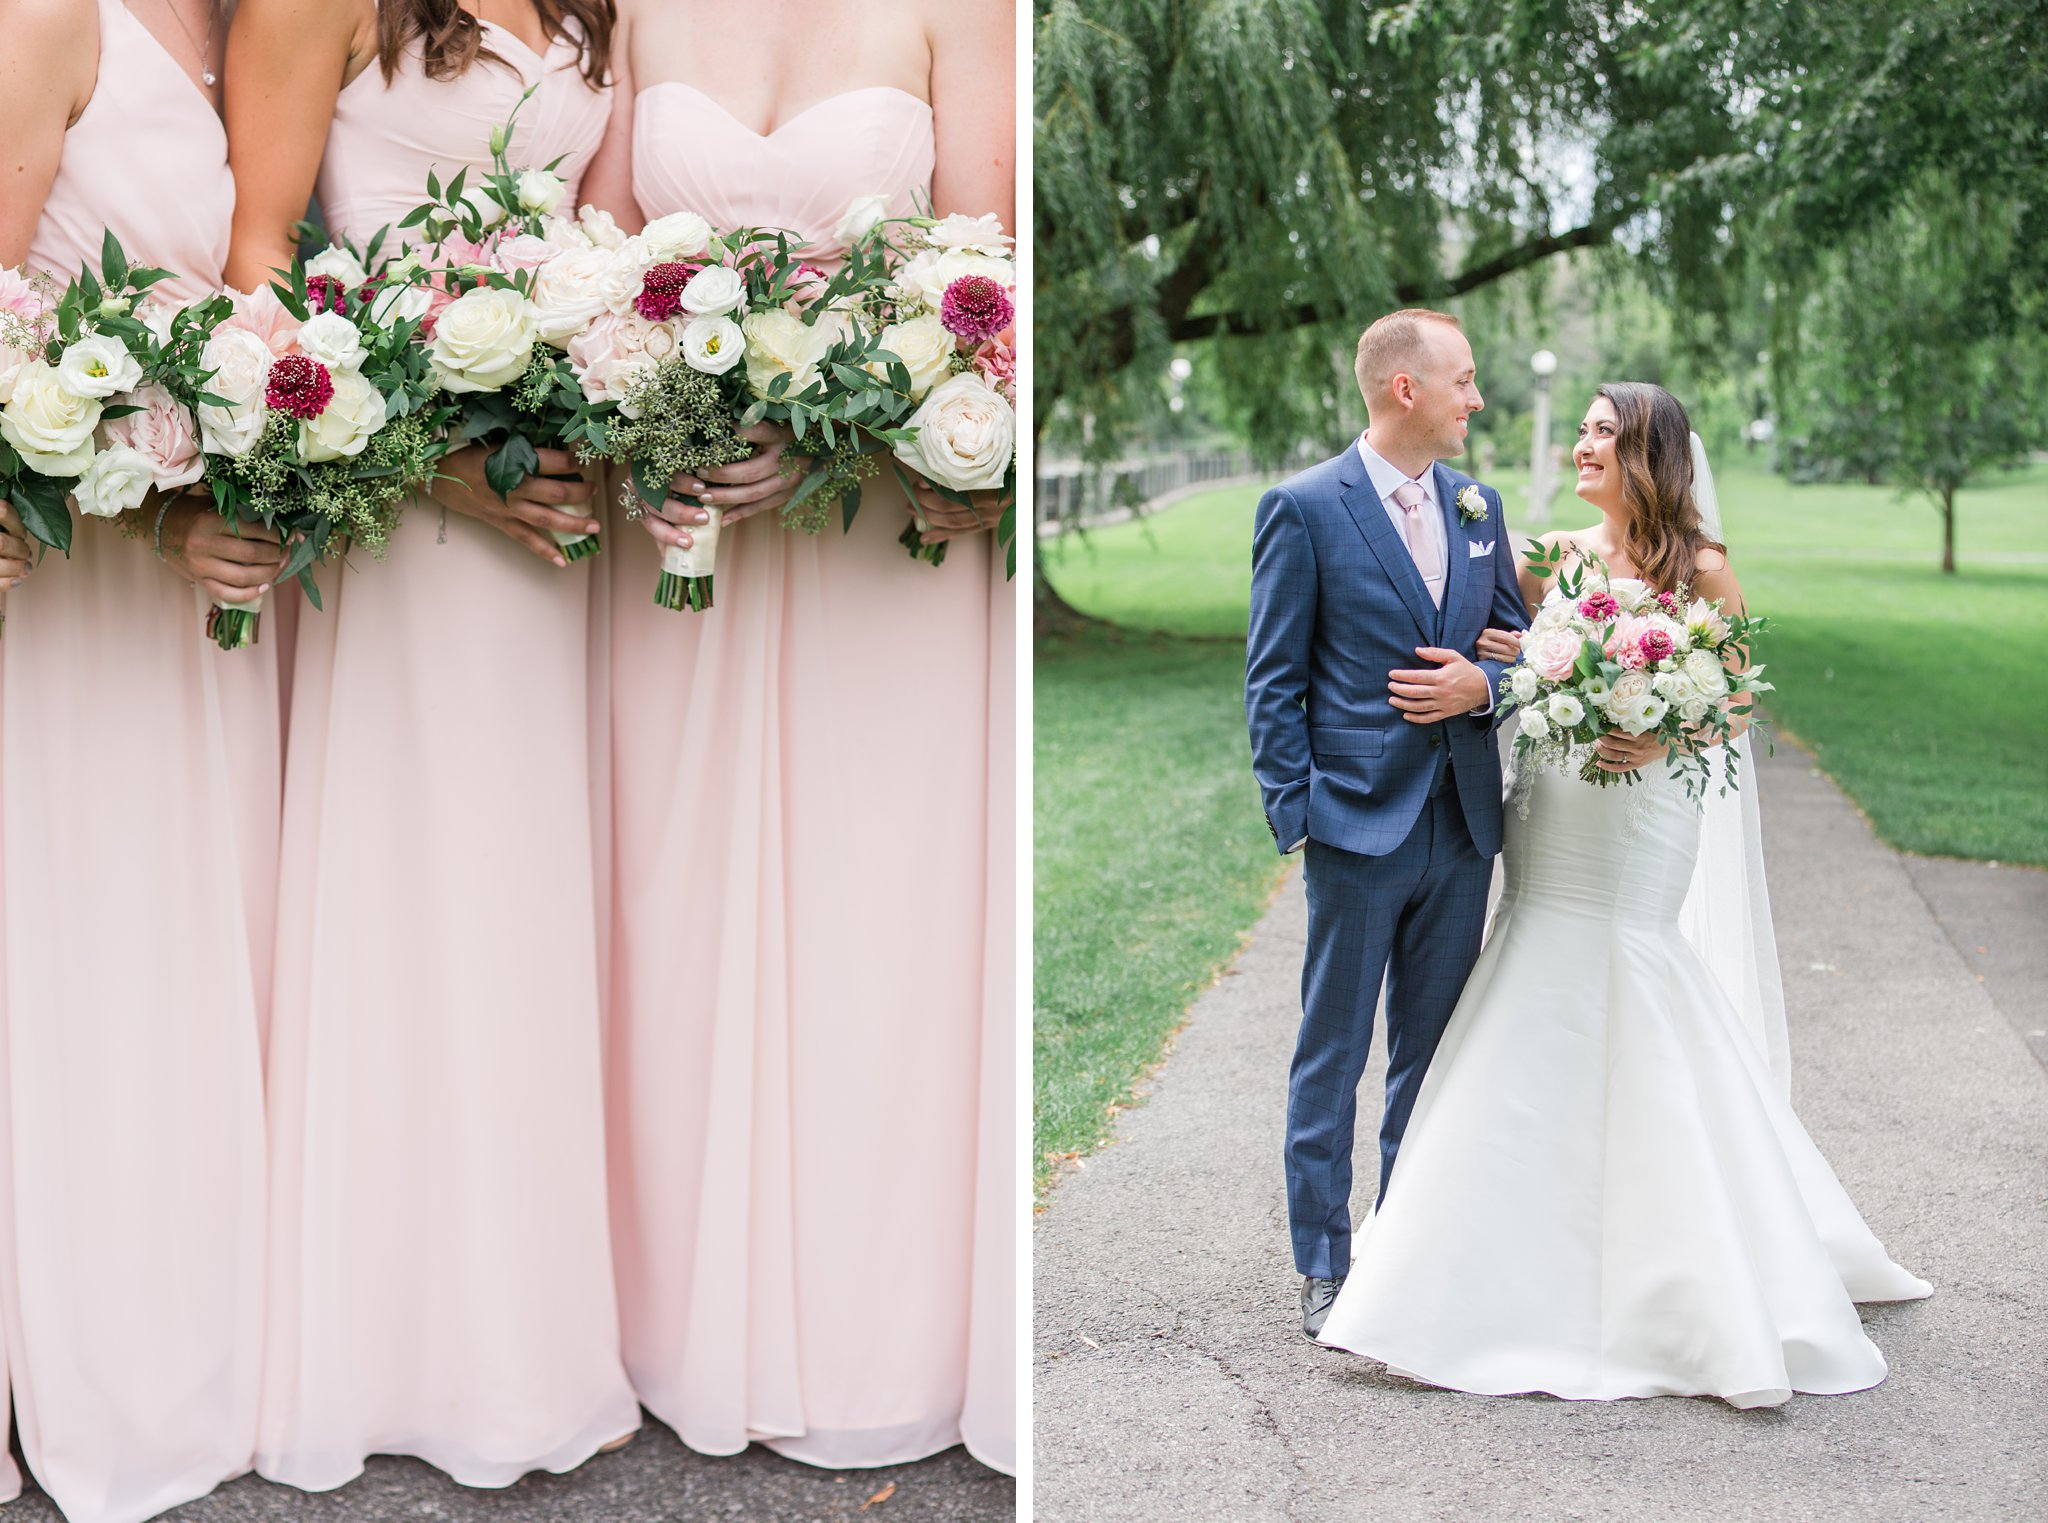 Blush bridesmaids dresses Horticulture Building wedding at Lansdowne Amy Pinder Photography